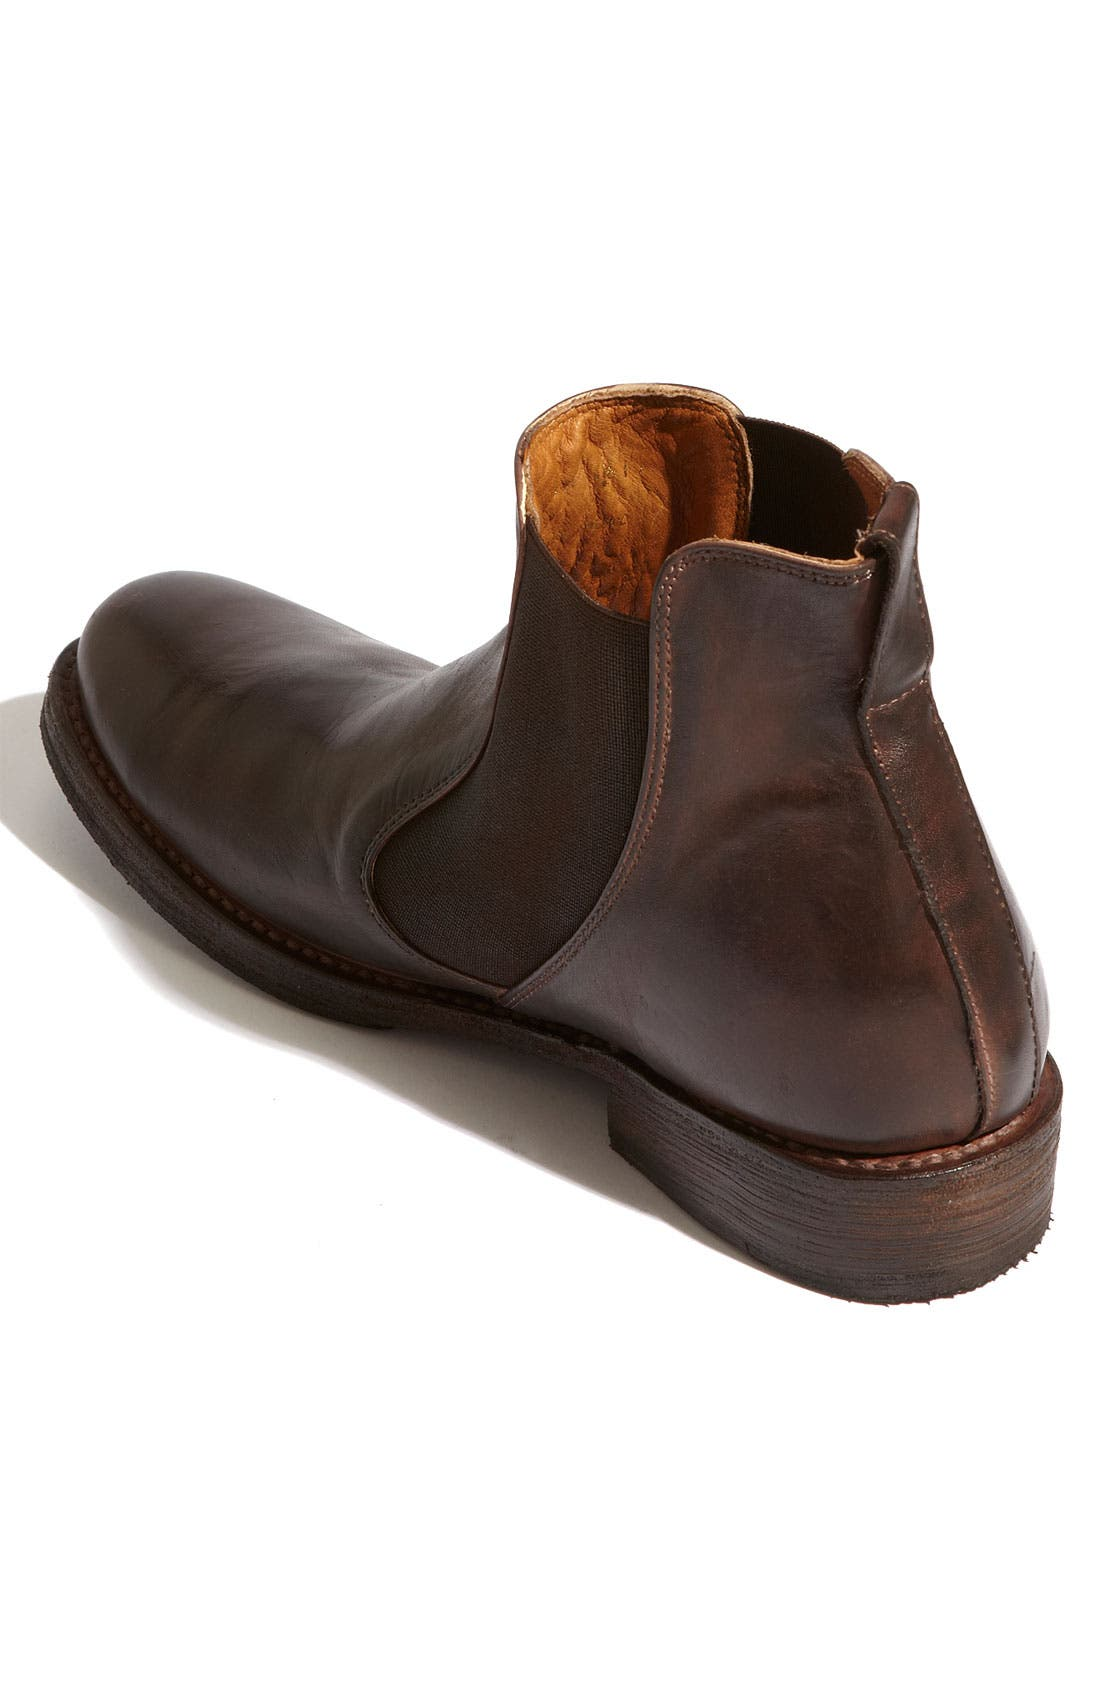 Alternate Image 3  - Bed Stu 'Recruit' Chelsea Boot